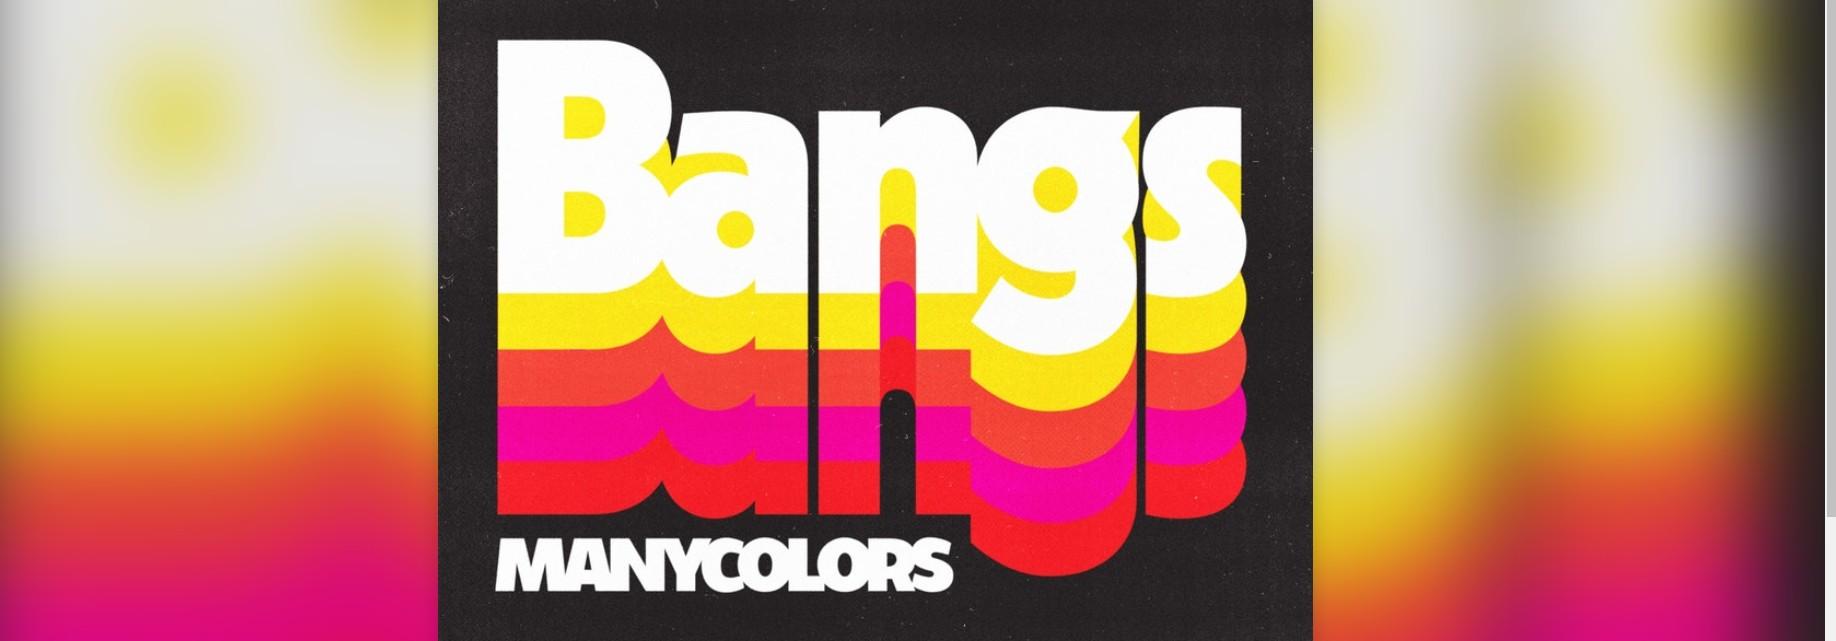 Many Colors Debut ''Bangs'' — COJAM: The Colorado Jam Scene